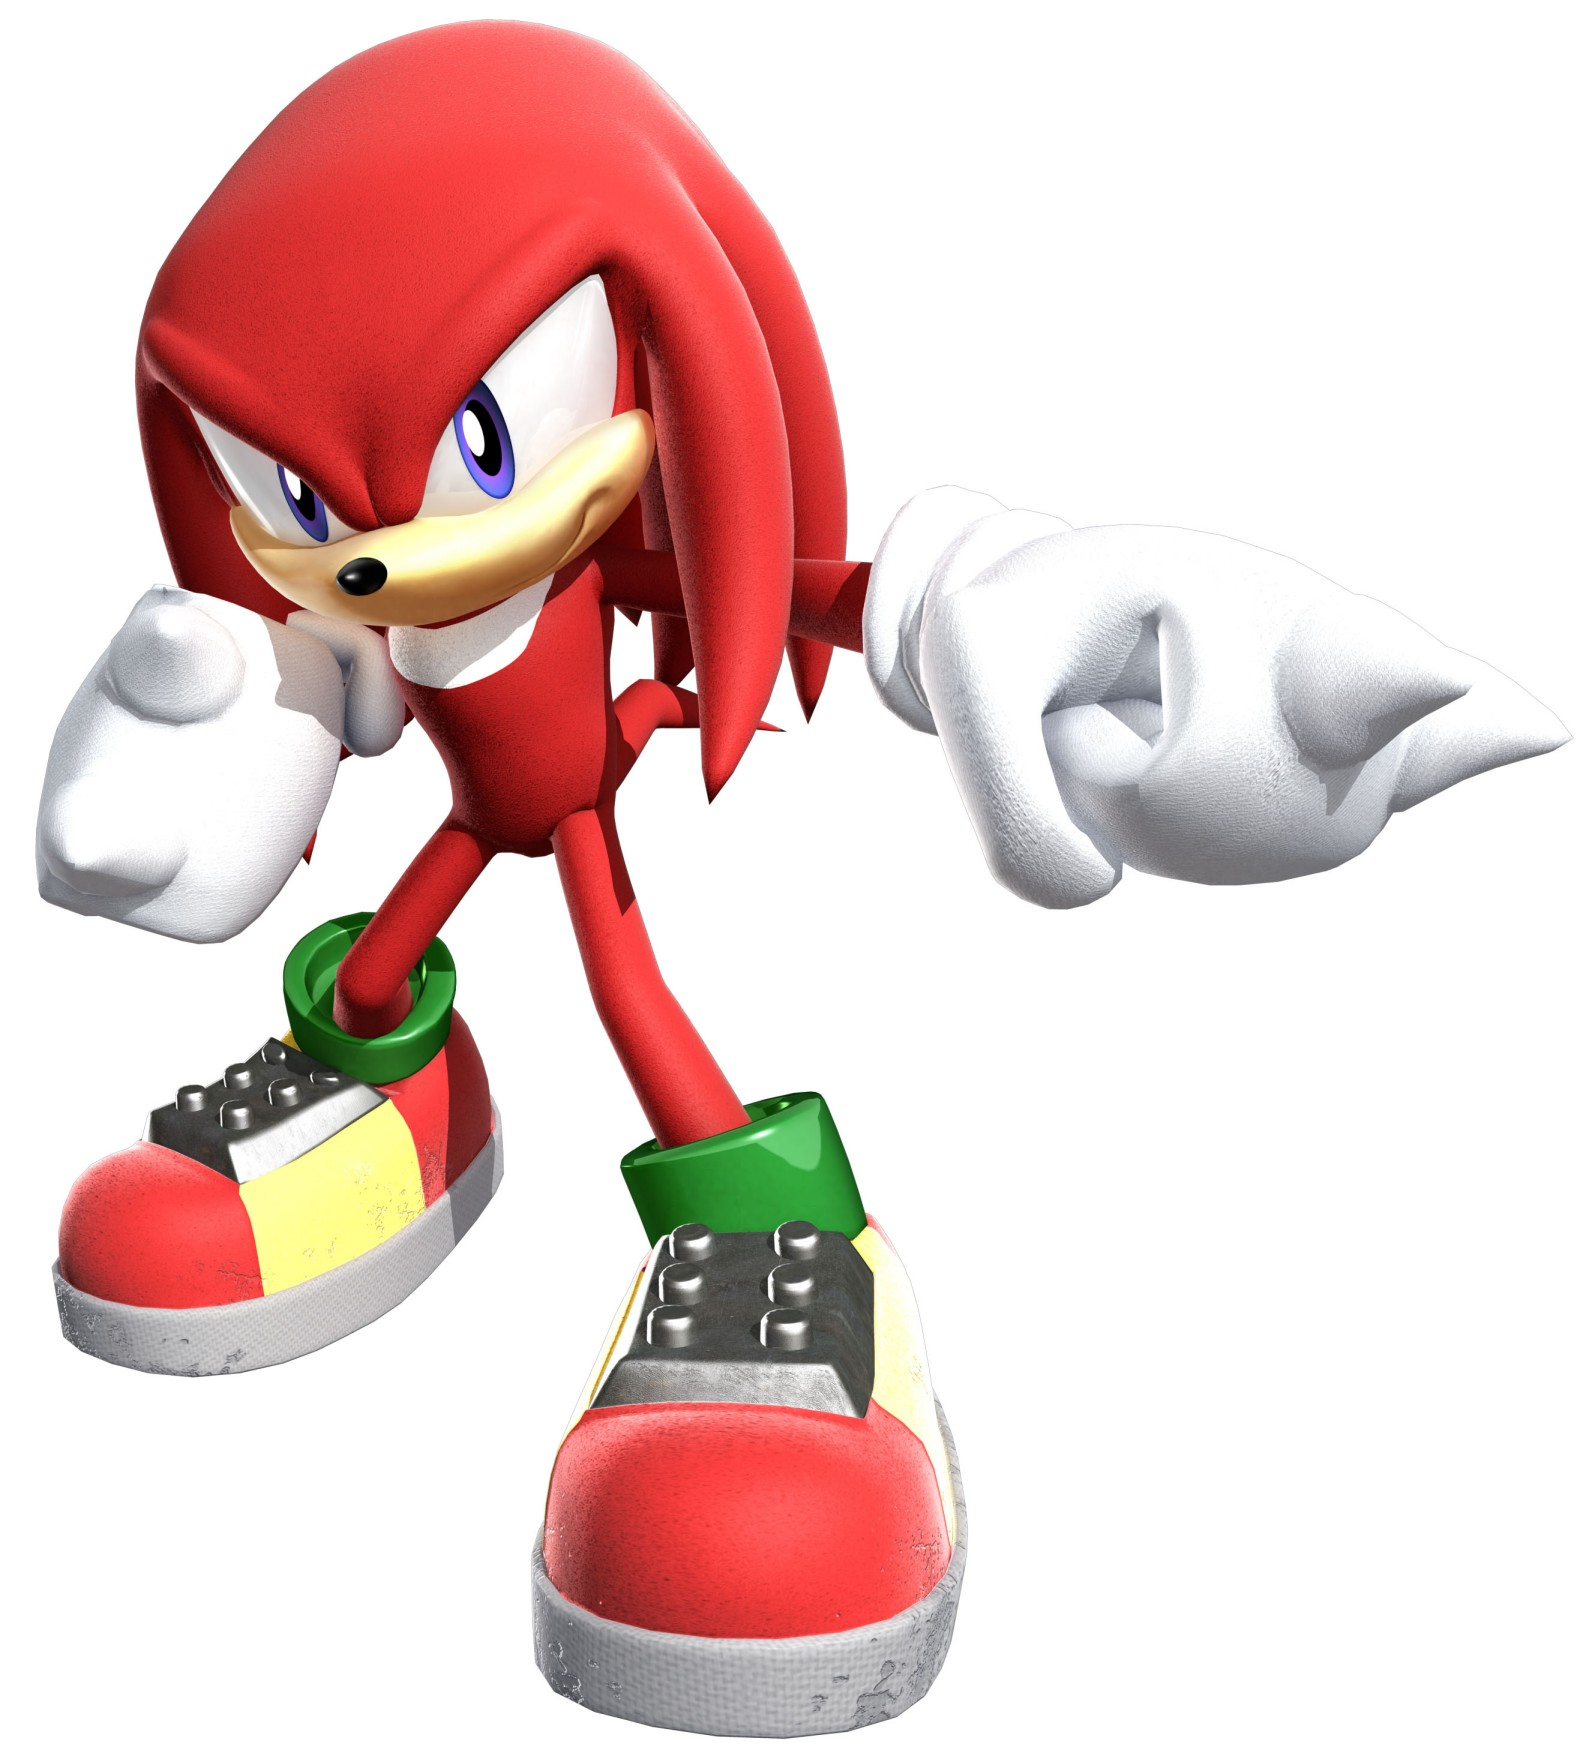 Knuckles The Echidna Sonic The Hedgehog Image 459794 Zerochan Anime Image Board